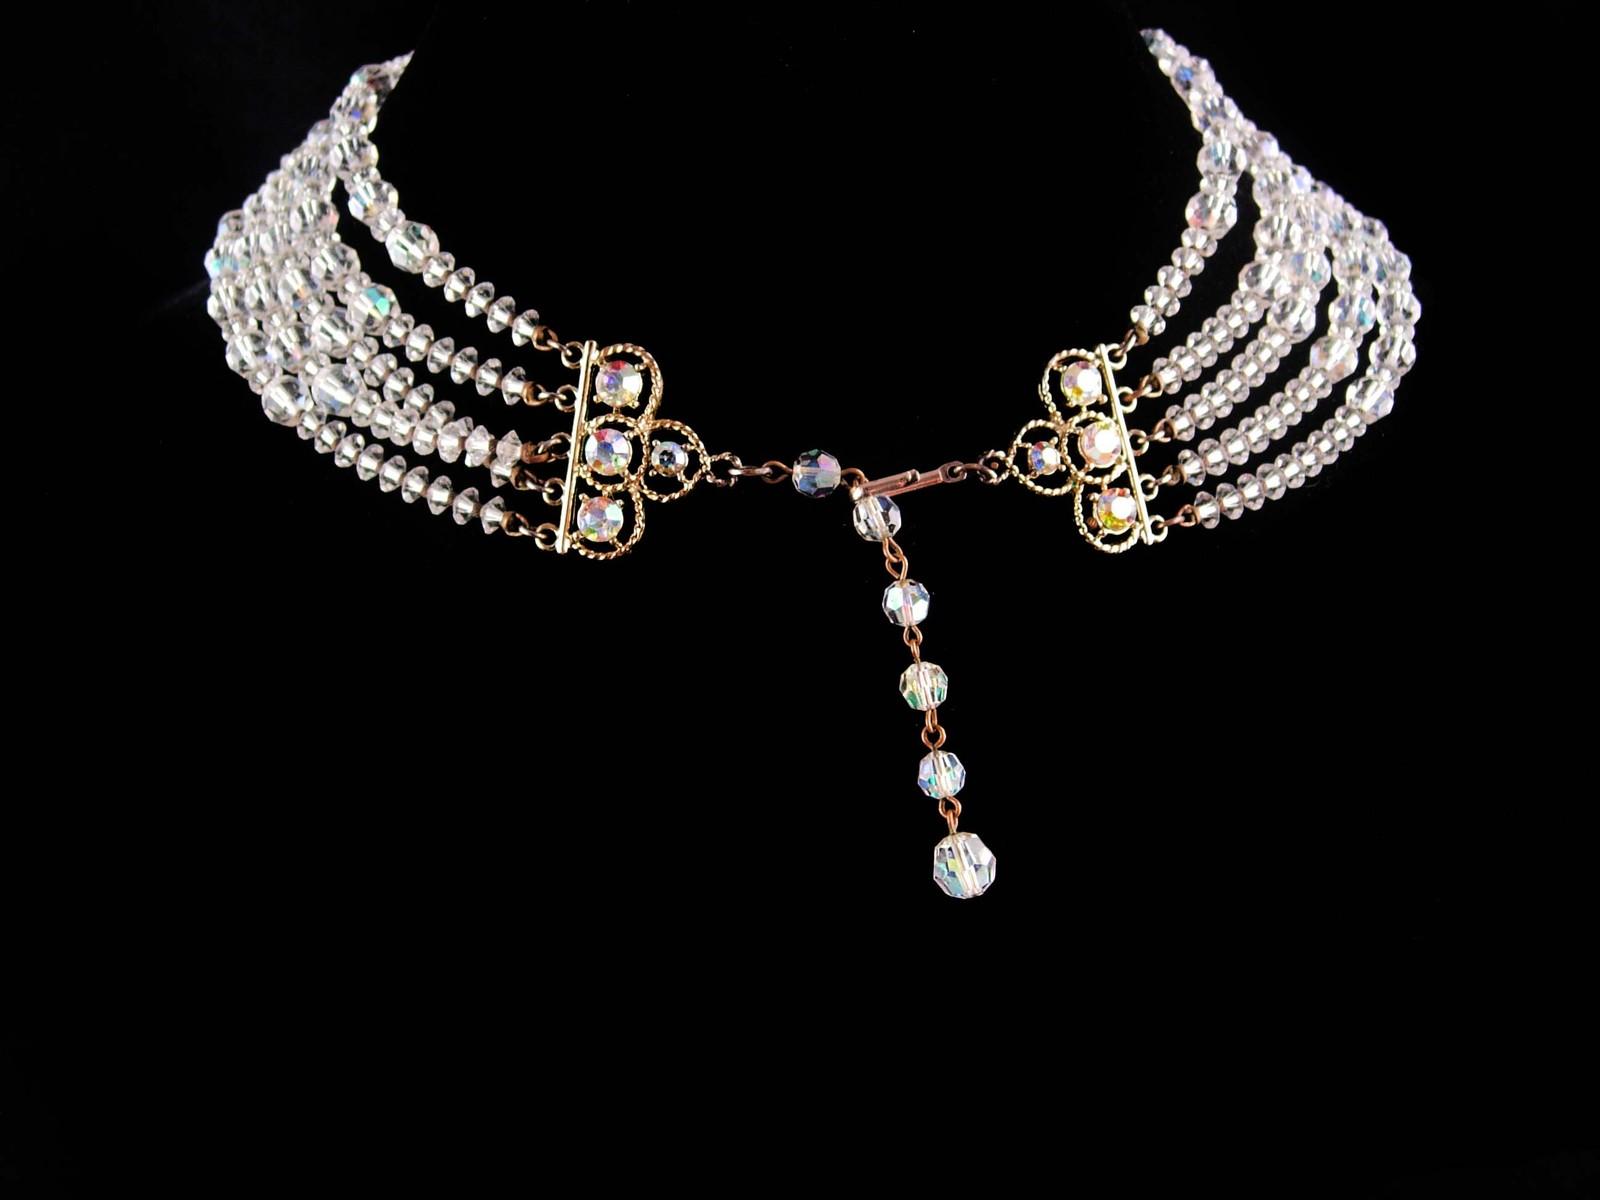 Vintage 5 strand necklace - statement aurora borealis choker - Vintage sparkling